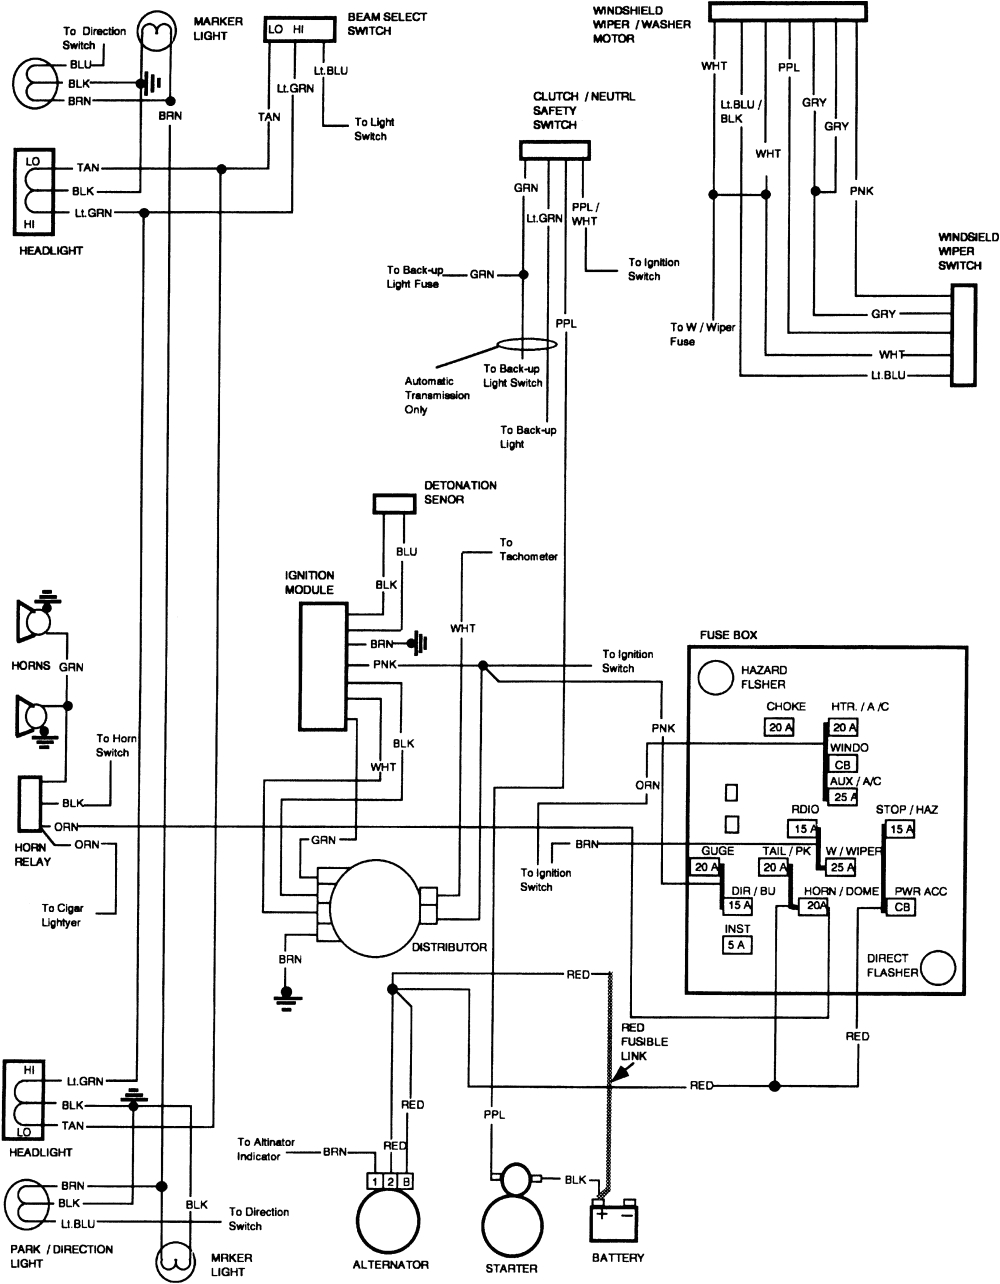 1981 chevy pickup engine wiring diagram wiring diagram week 1981 chevy pickup wiring diagram 1981 chevy